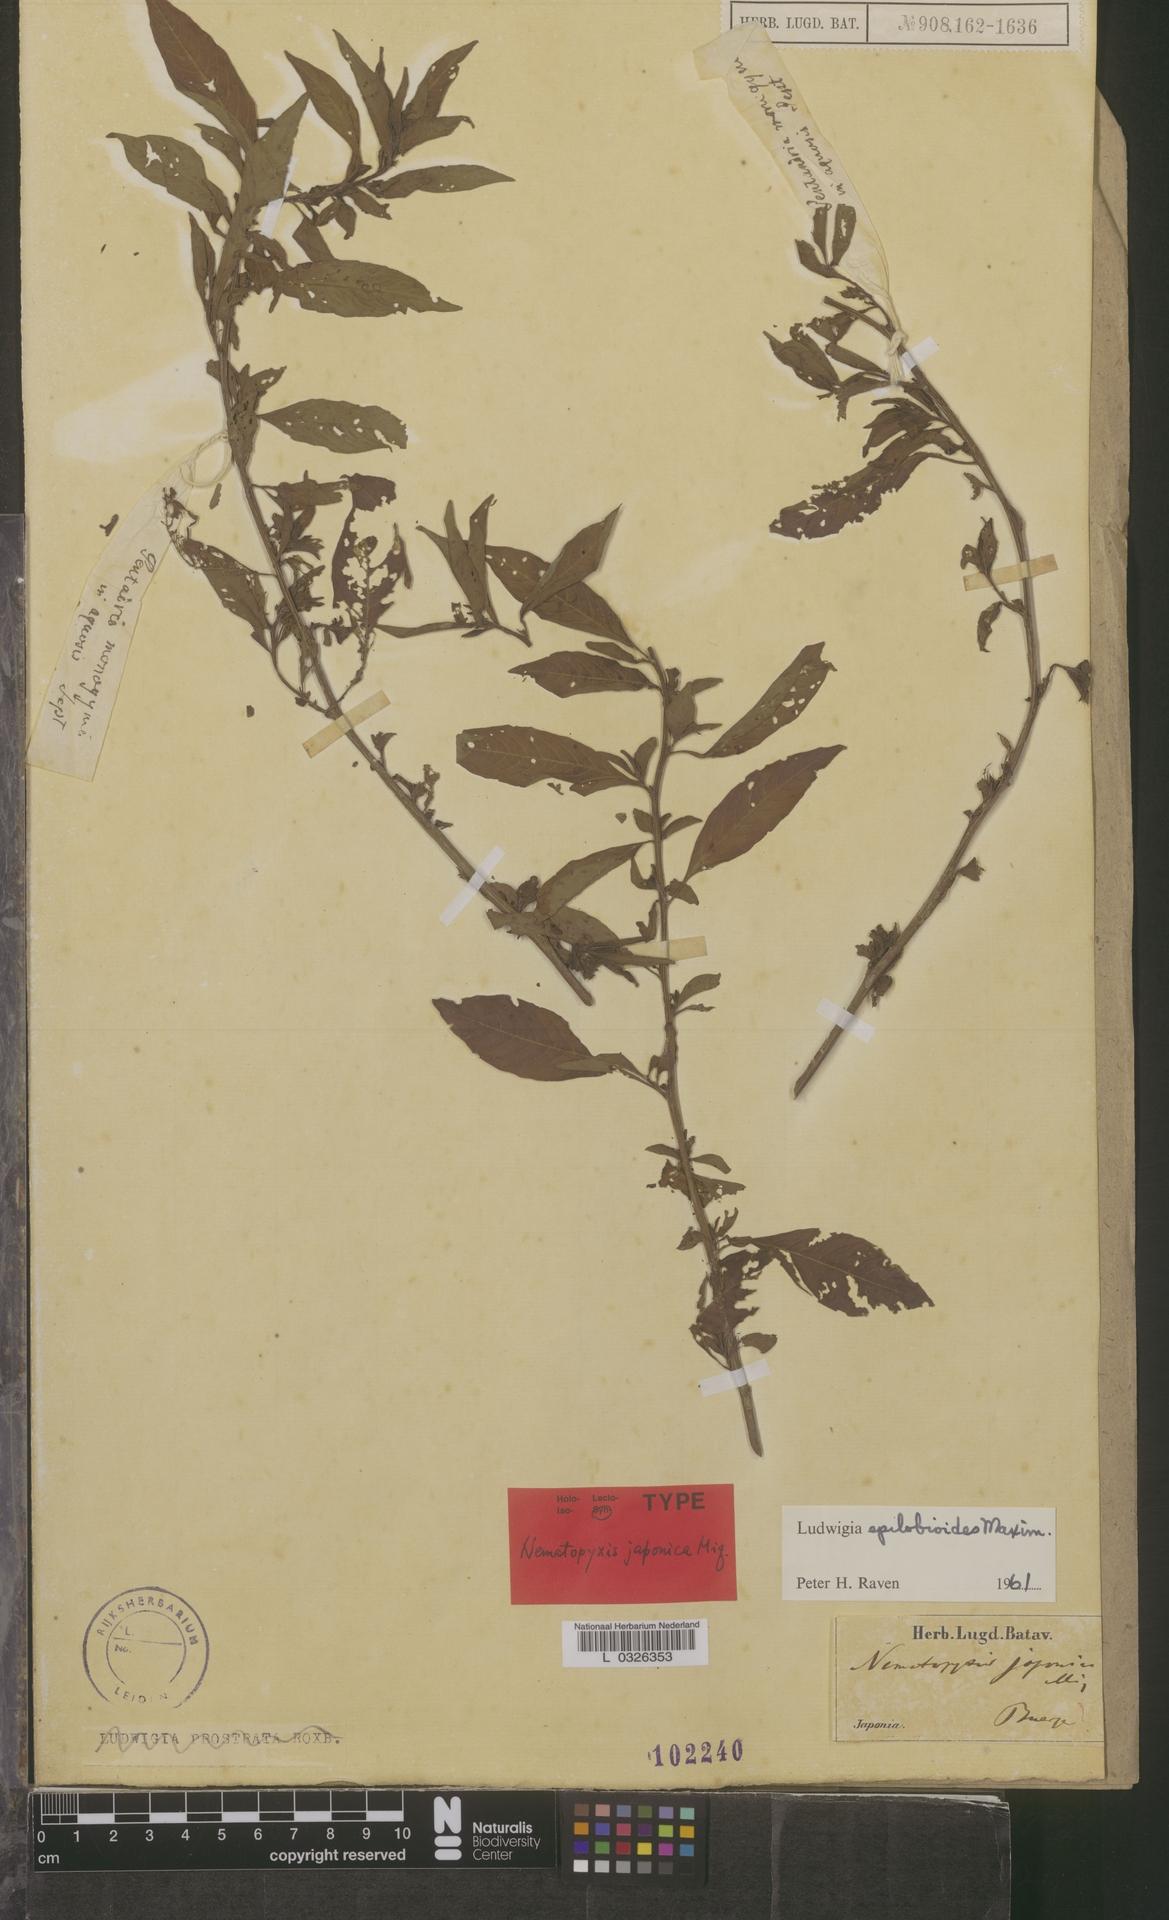 L  0326353 | Ludwigia epilobioides Maxim.